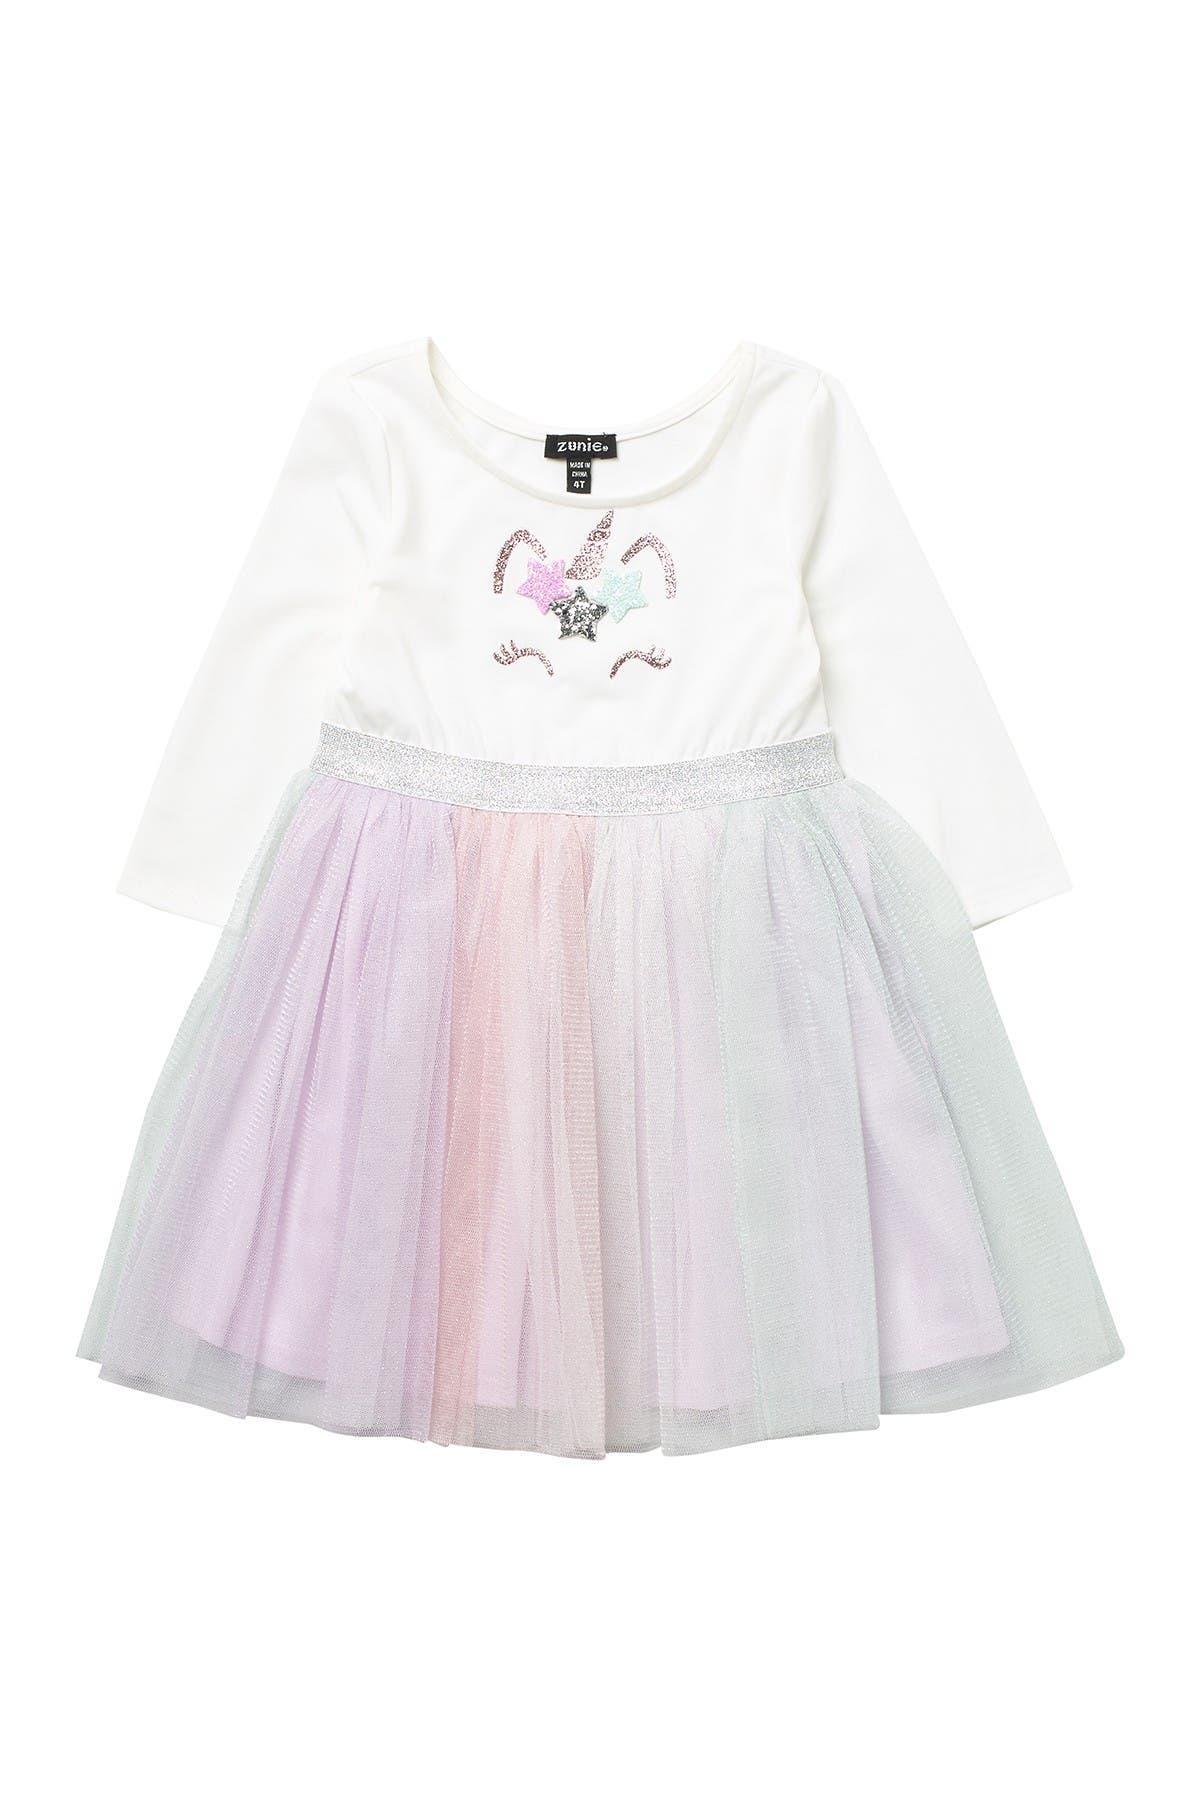 Image of Zunie 3/4 Sleeve Unicorn Bodice Dress